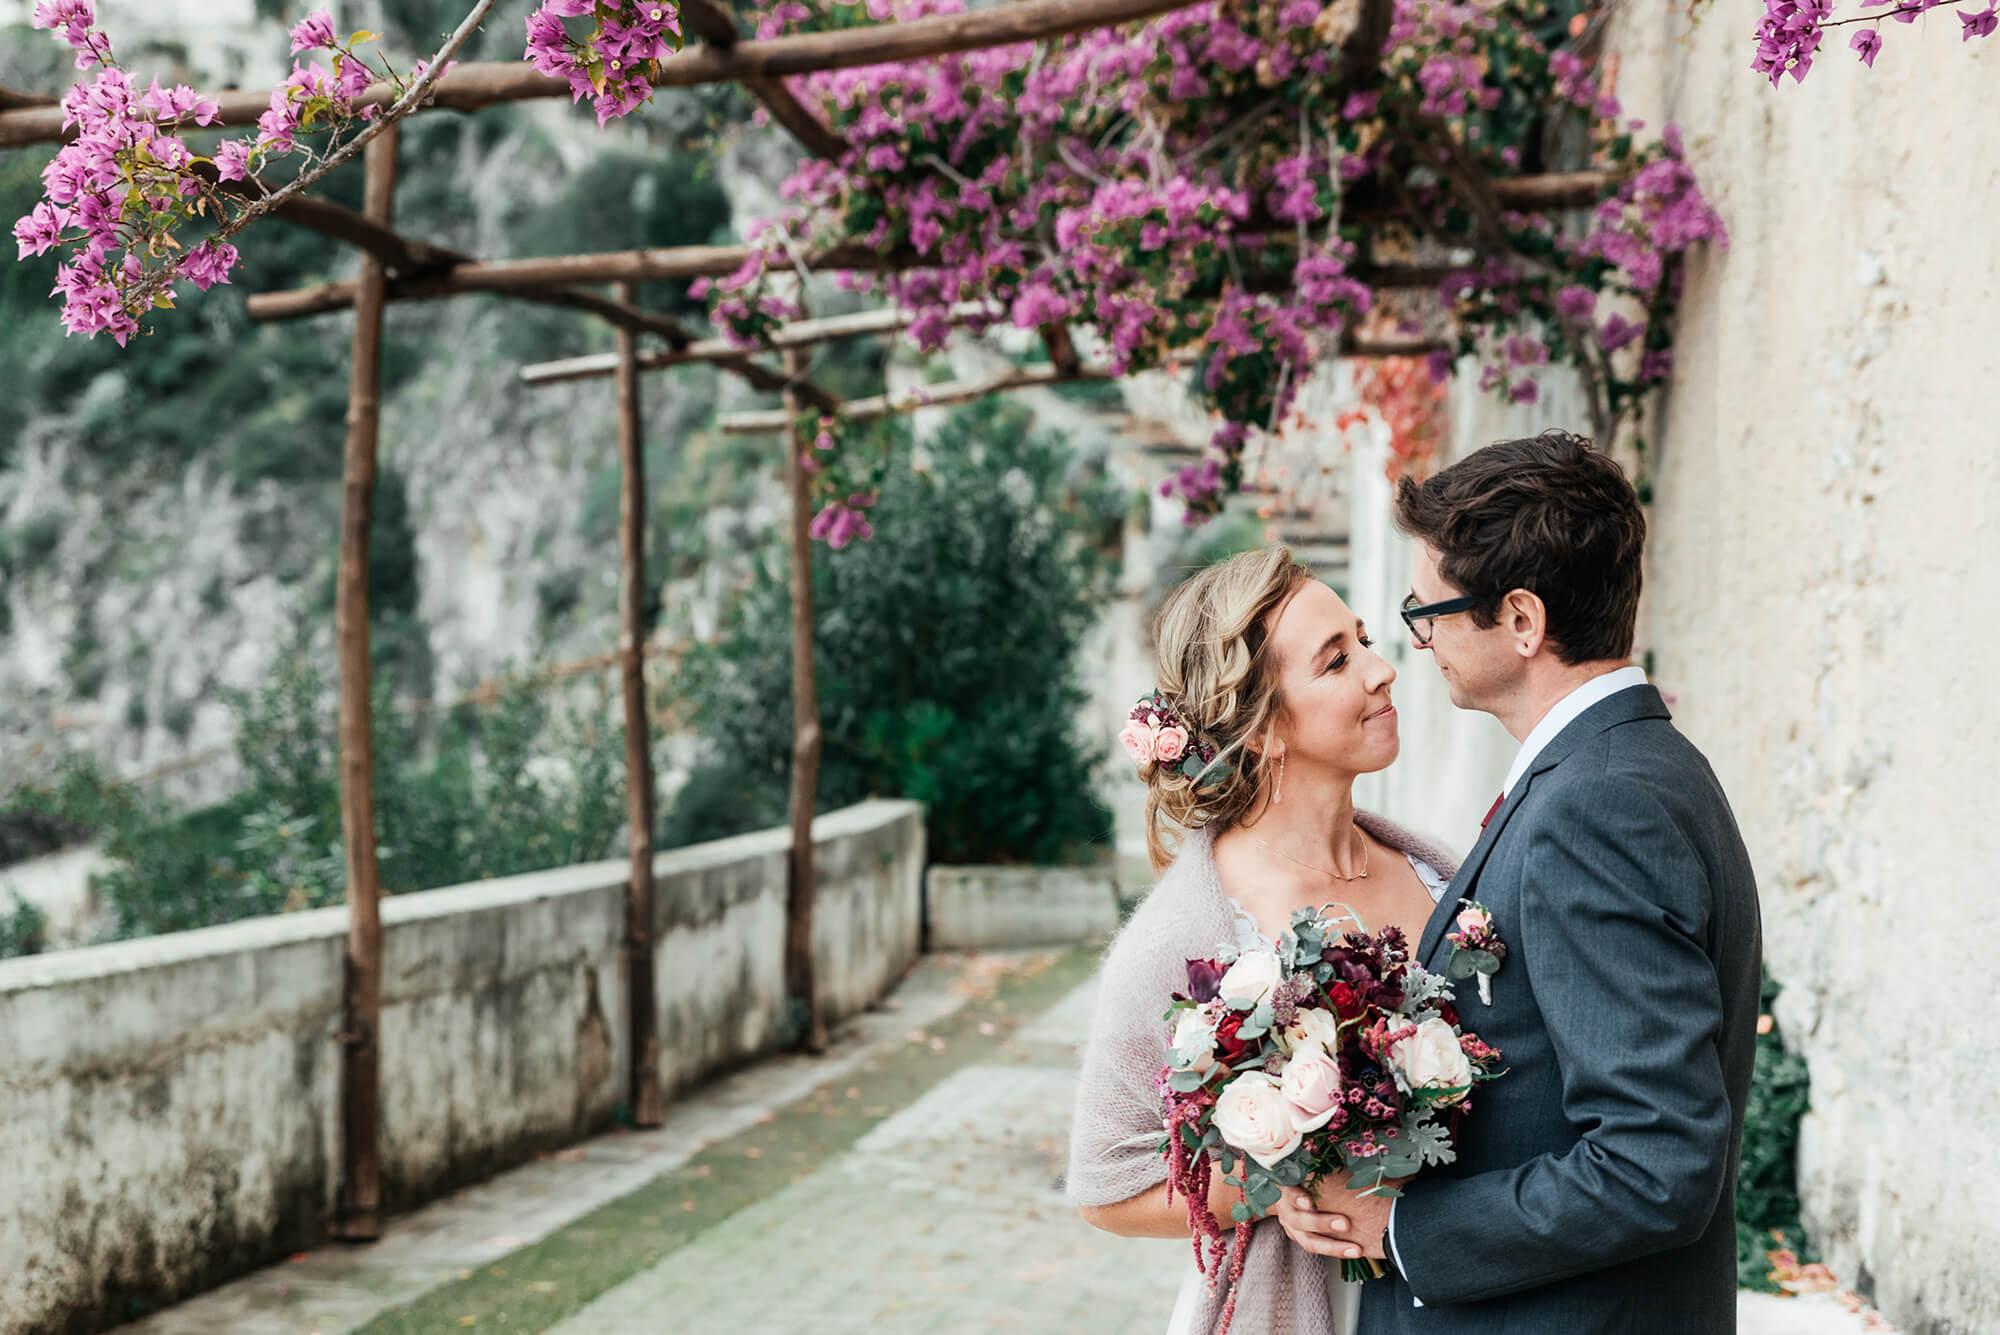 Autumn elopement in Italy (1)